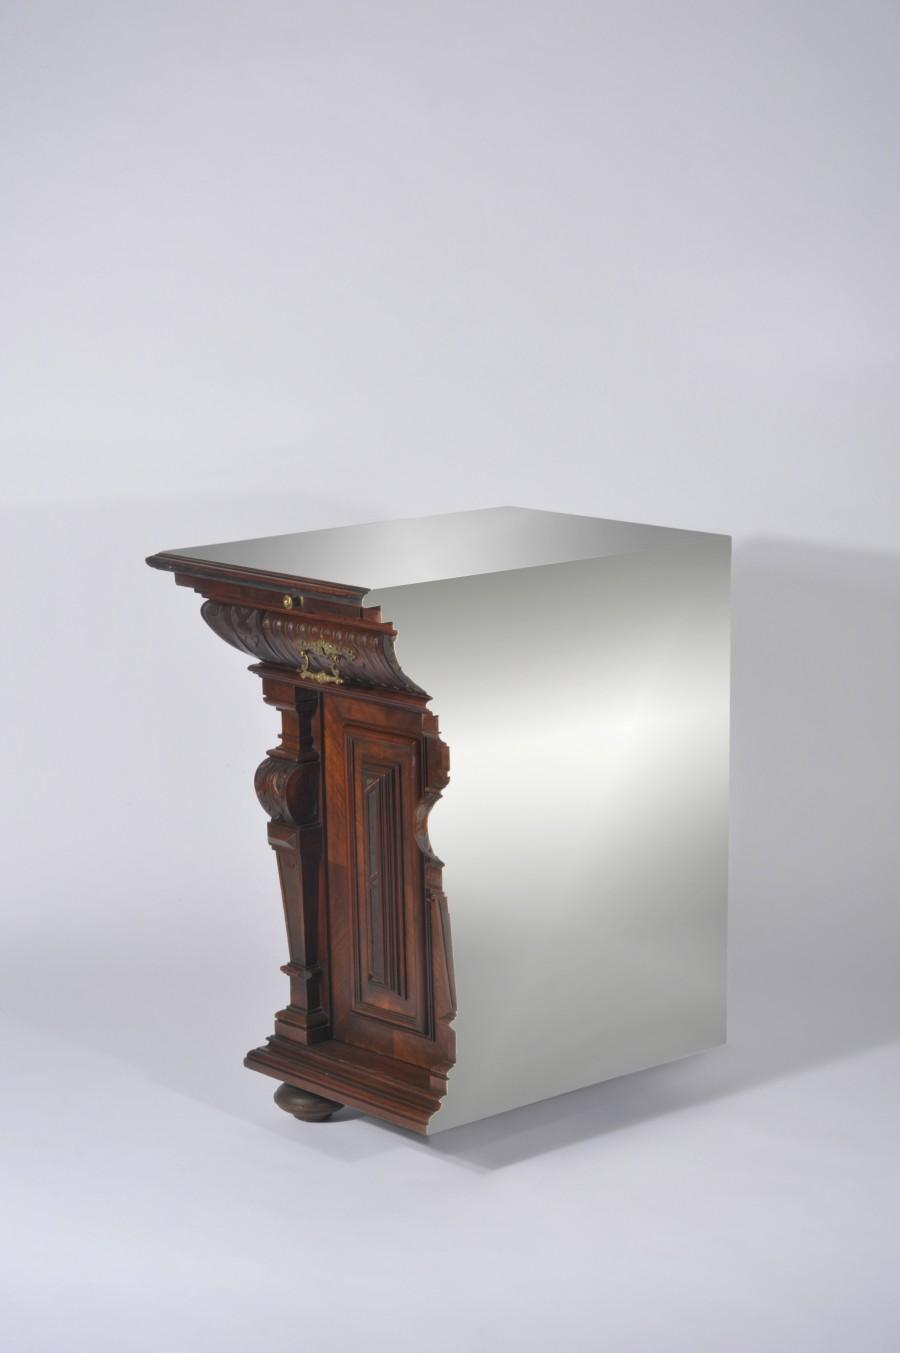 Presented by Judy Straten Art Design, Rolf Bruggink, Cutted Cabinet